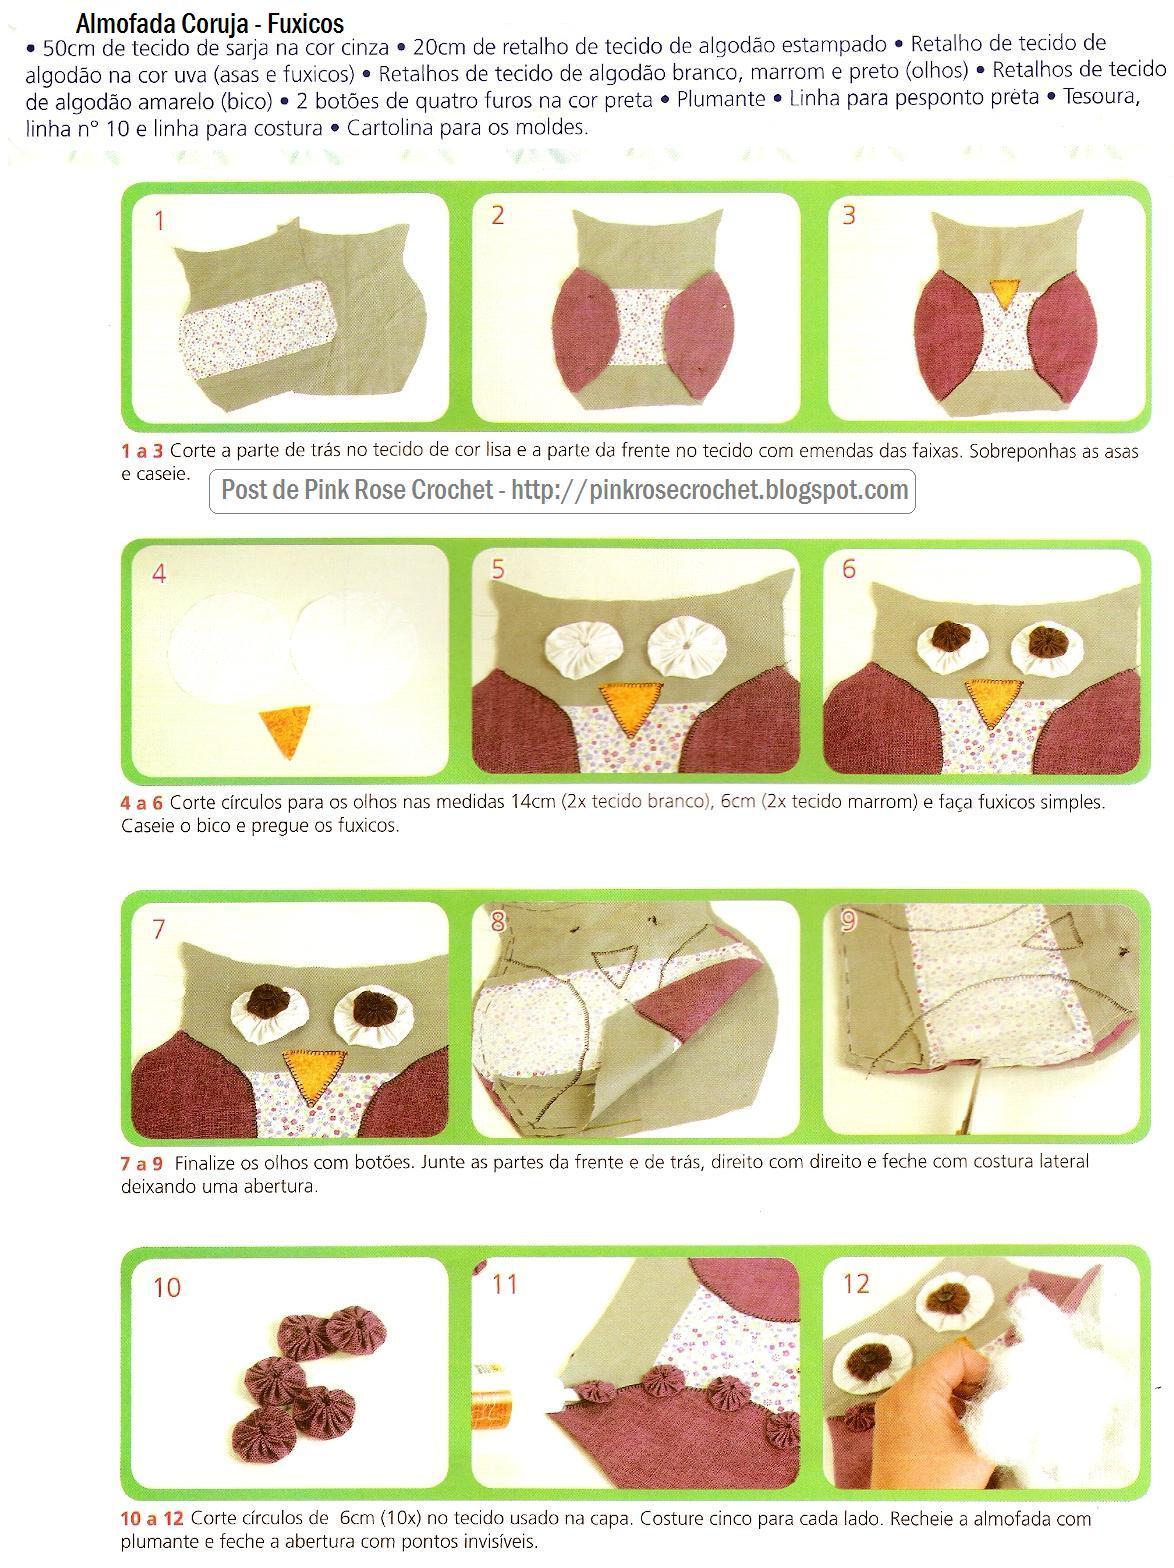 http://4.bp.blogspot.com/_hI7QFaqugIw/TILbSuXZpdI/AAAAAAAAQaQ/kpwHsCmcai8/s1600/Fuxico+-+Almofada+Coruja+-+Pap+-+PRose+Crochet.JPG